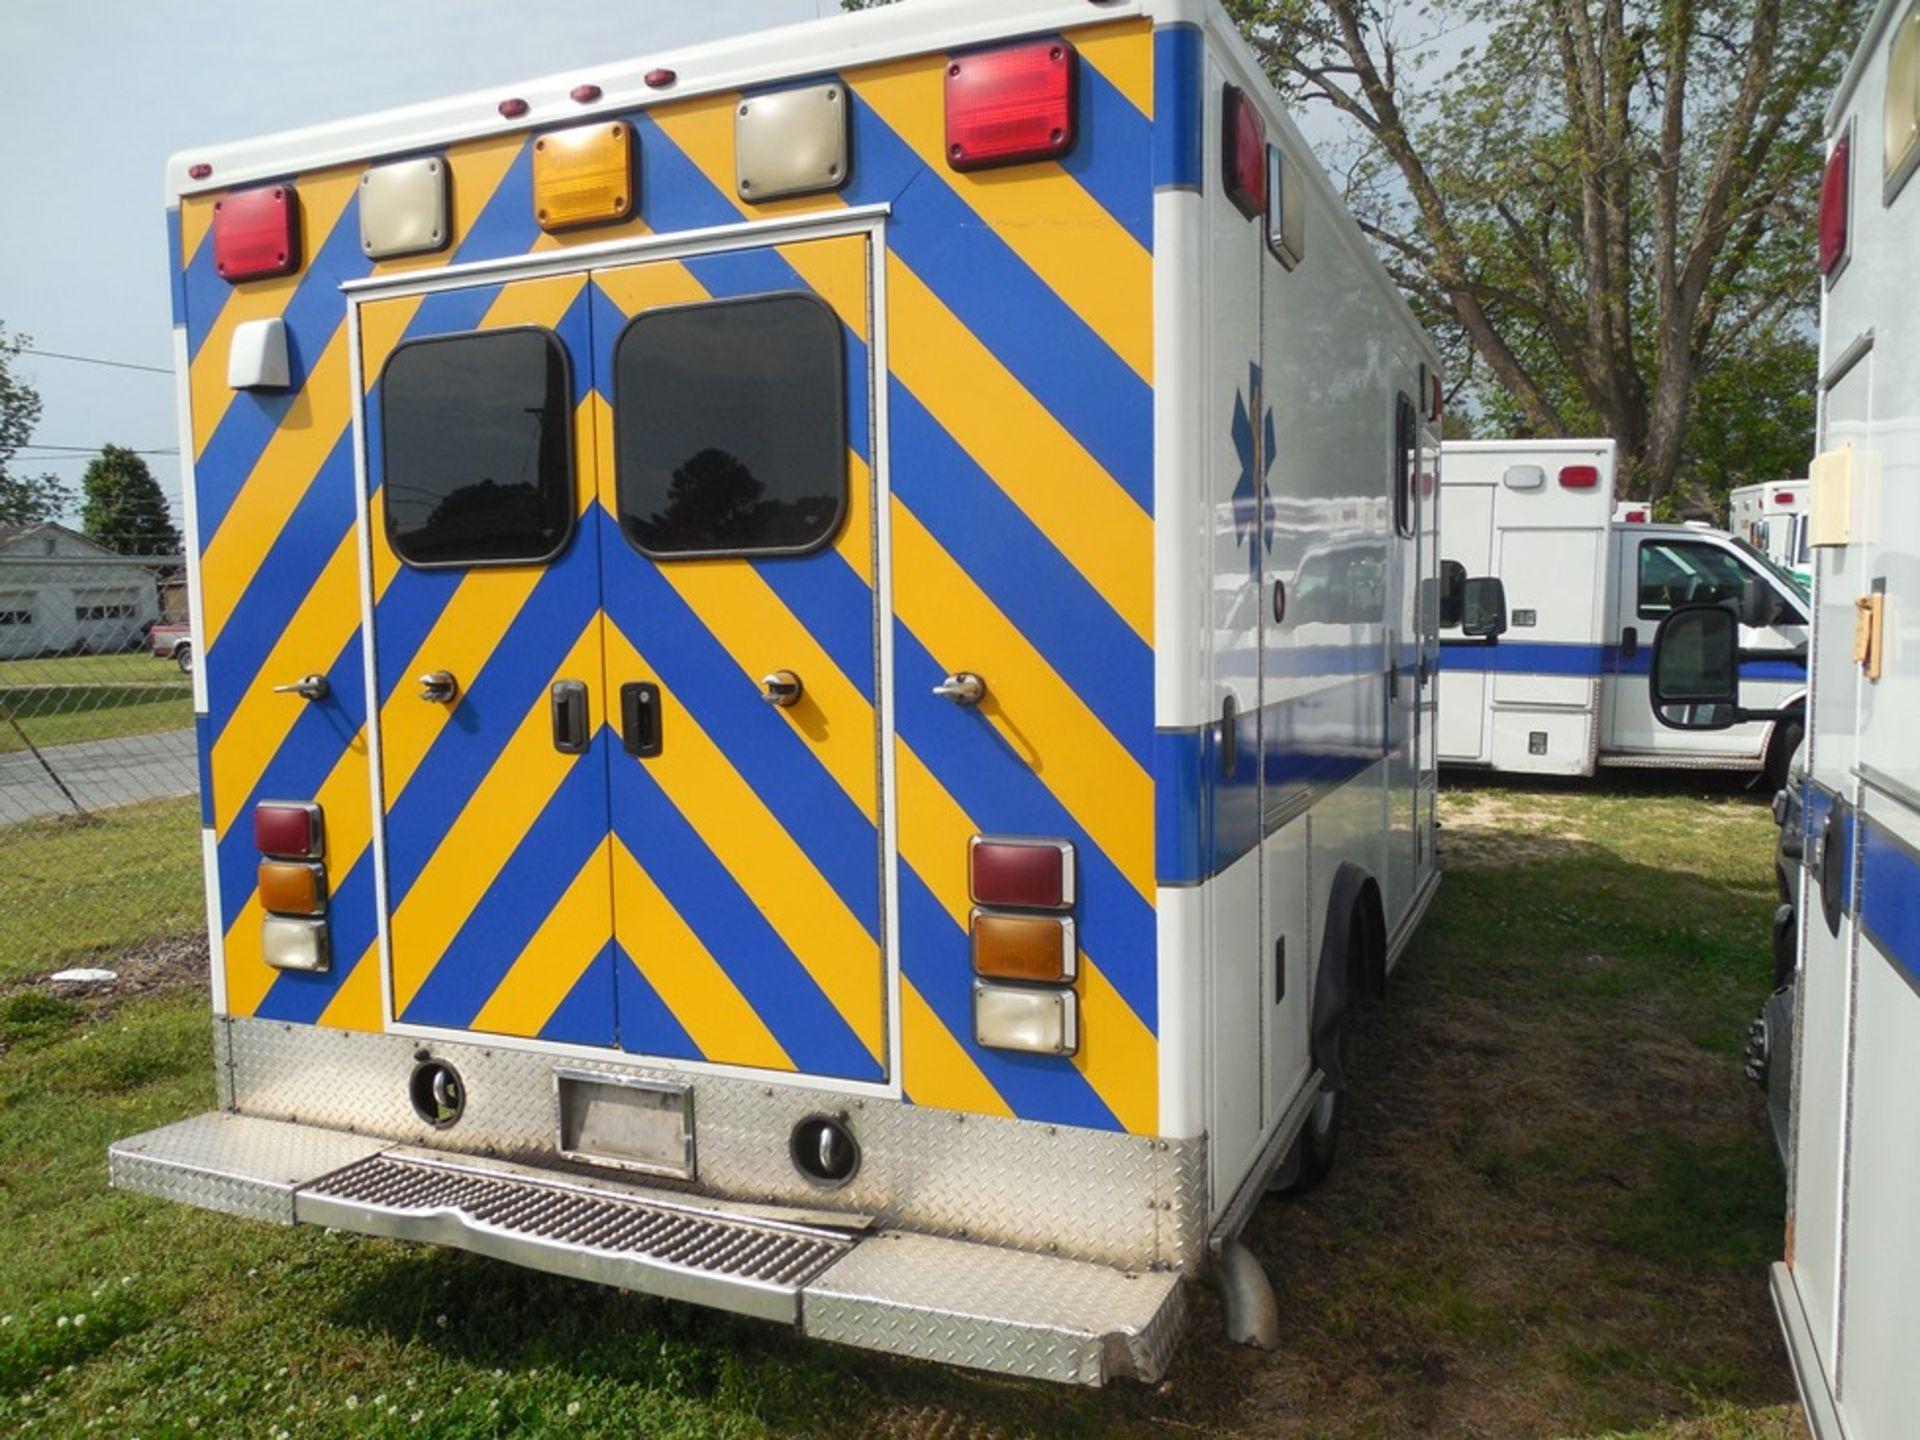 2010 Chev box van ambulance dsl, 250,597 miles, vin# 1GB9G5B65A1116120 - Image 4 of 6